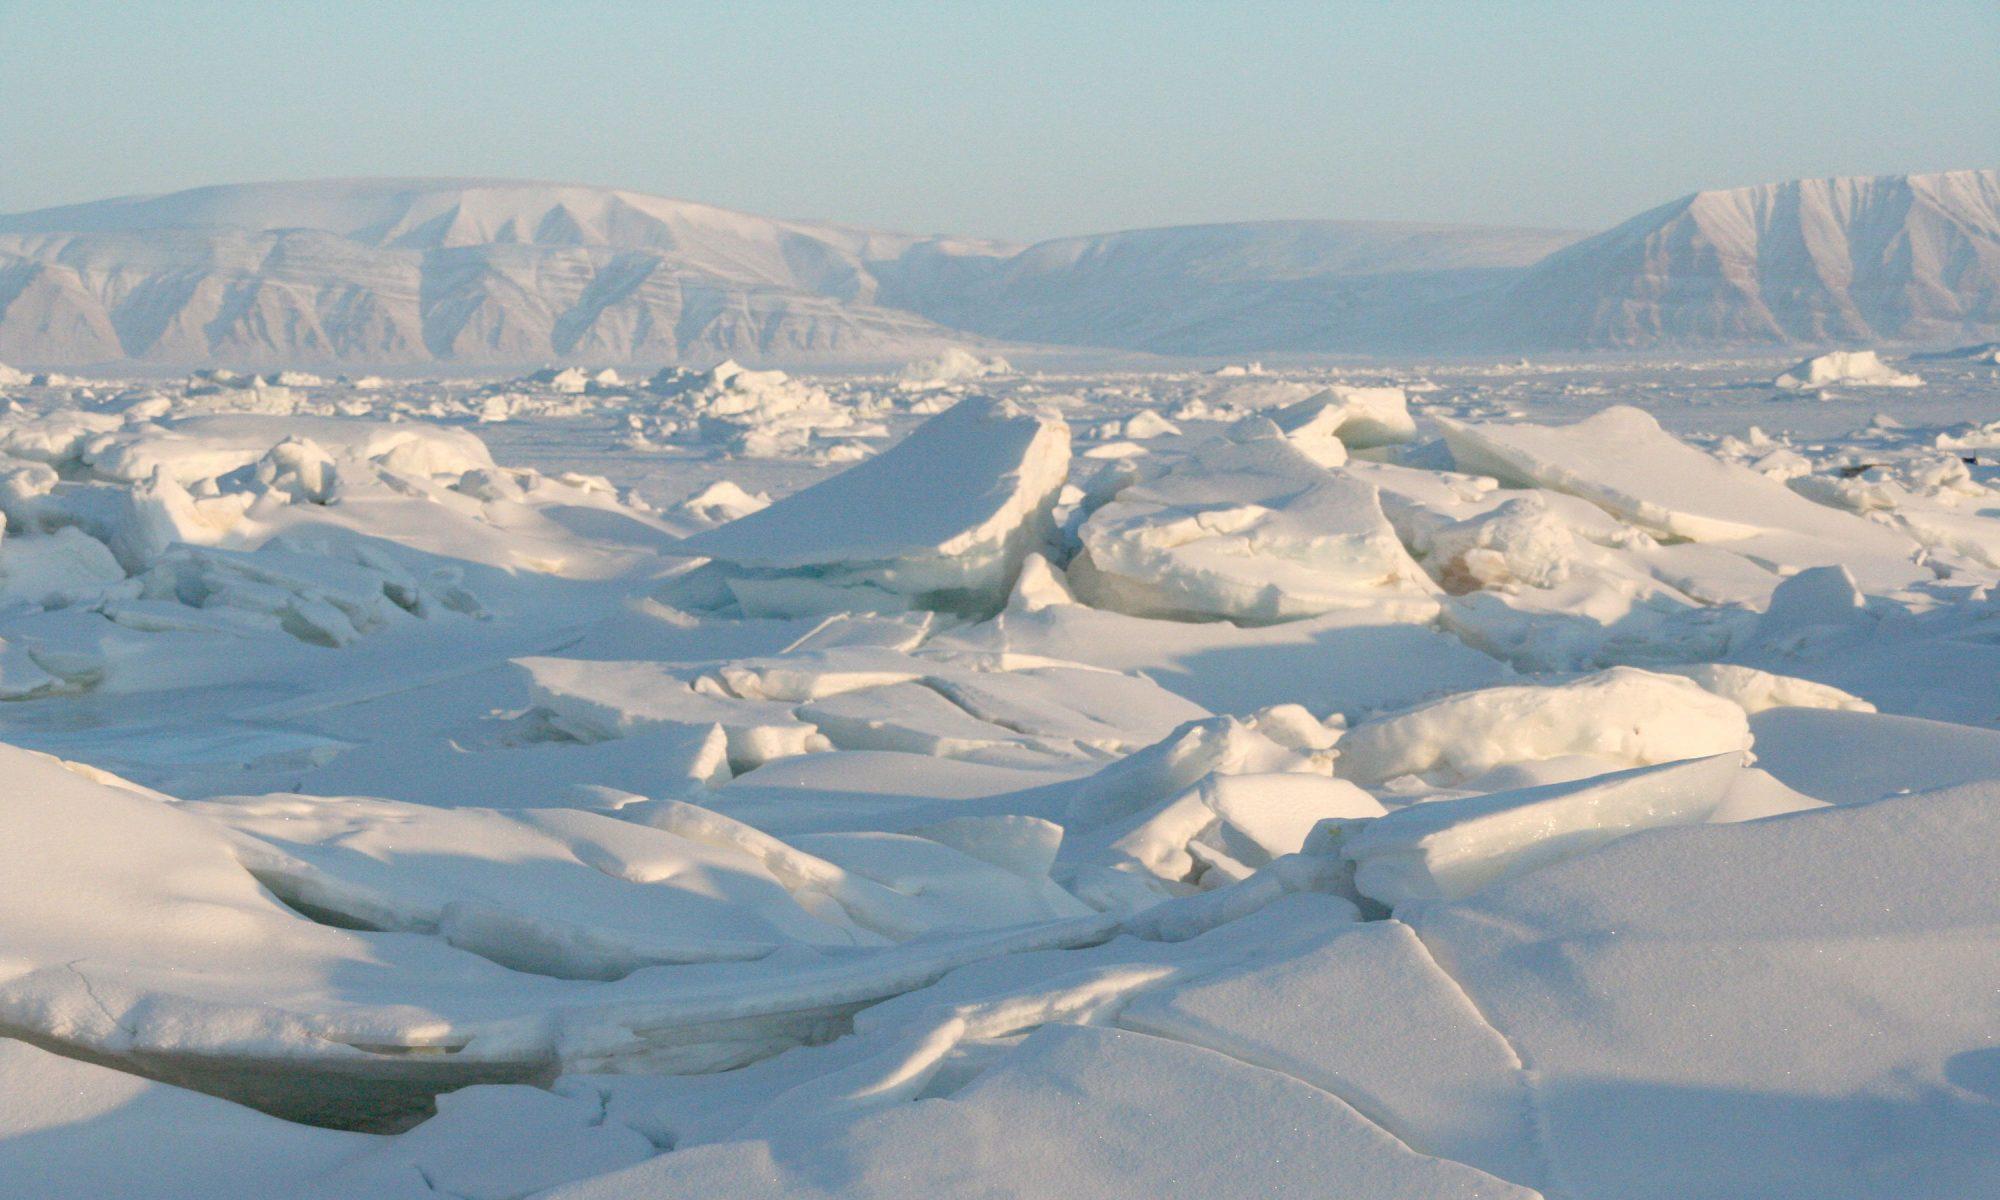 ArcticCapital